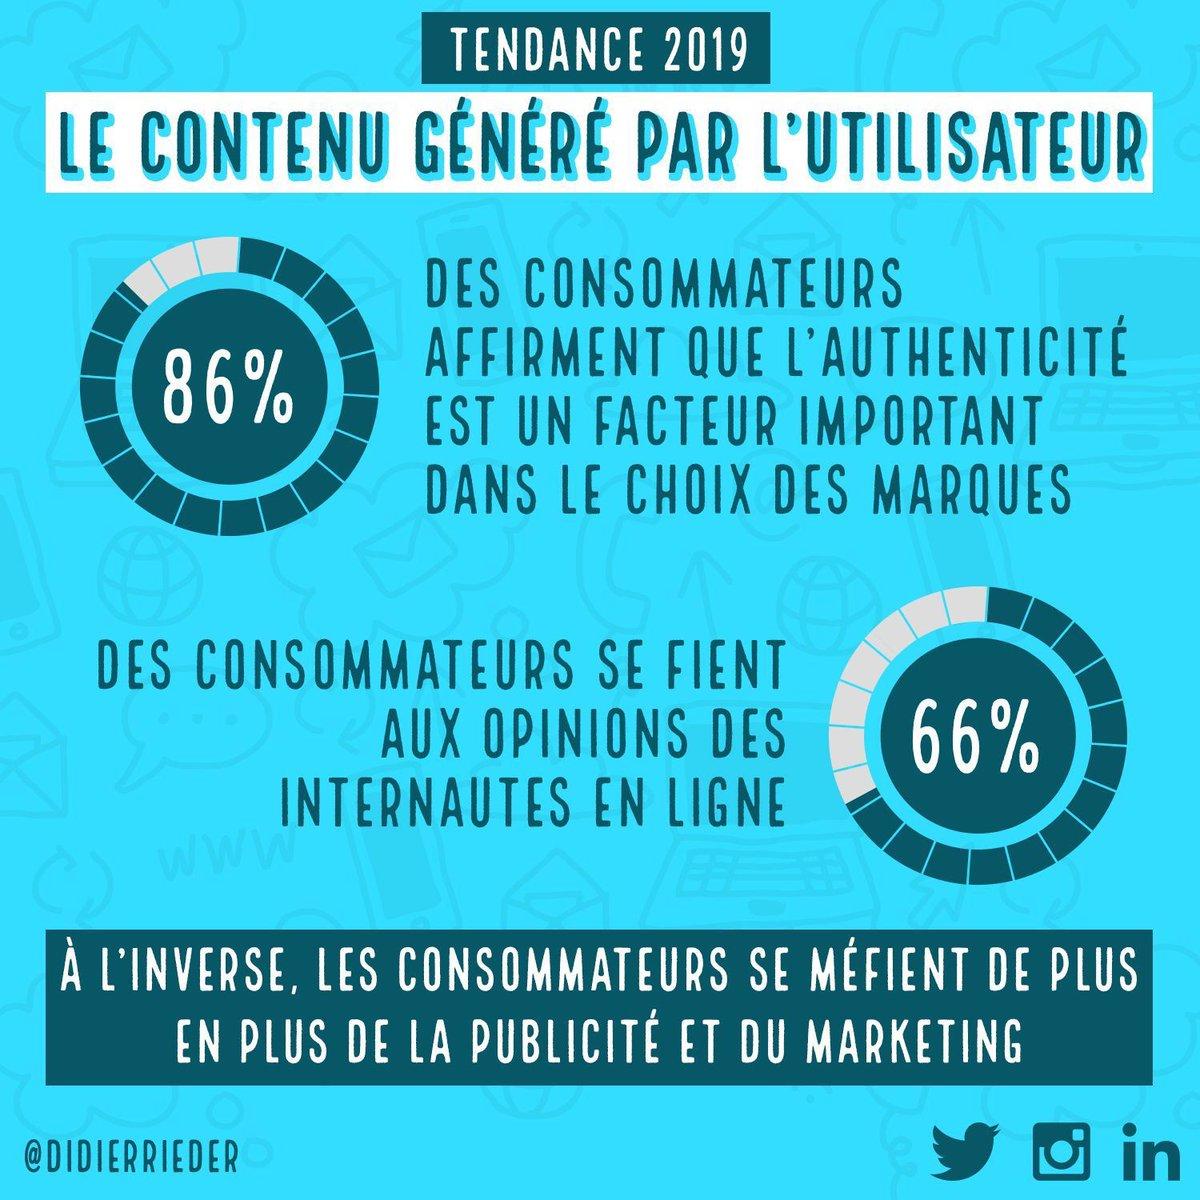 🔎 #Trends - Les tendances de l'#UGC en 2019 via @didierrieder #ContentMarketing #SocialMedia